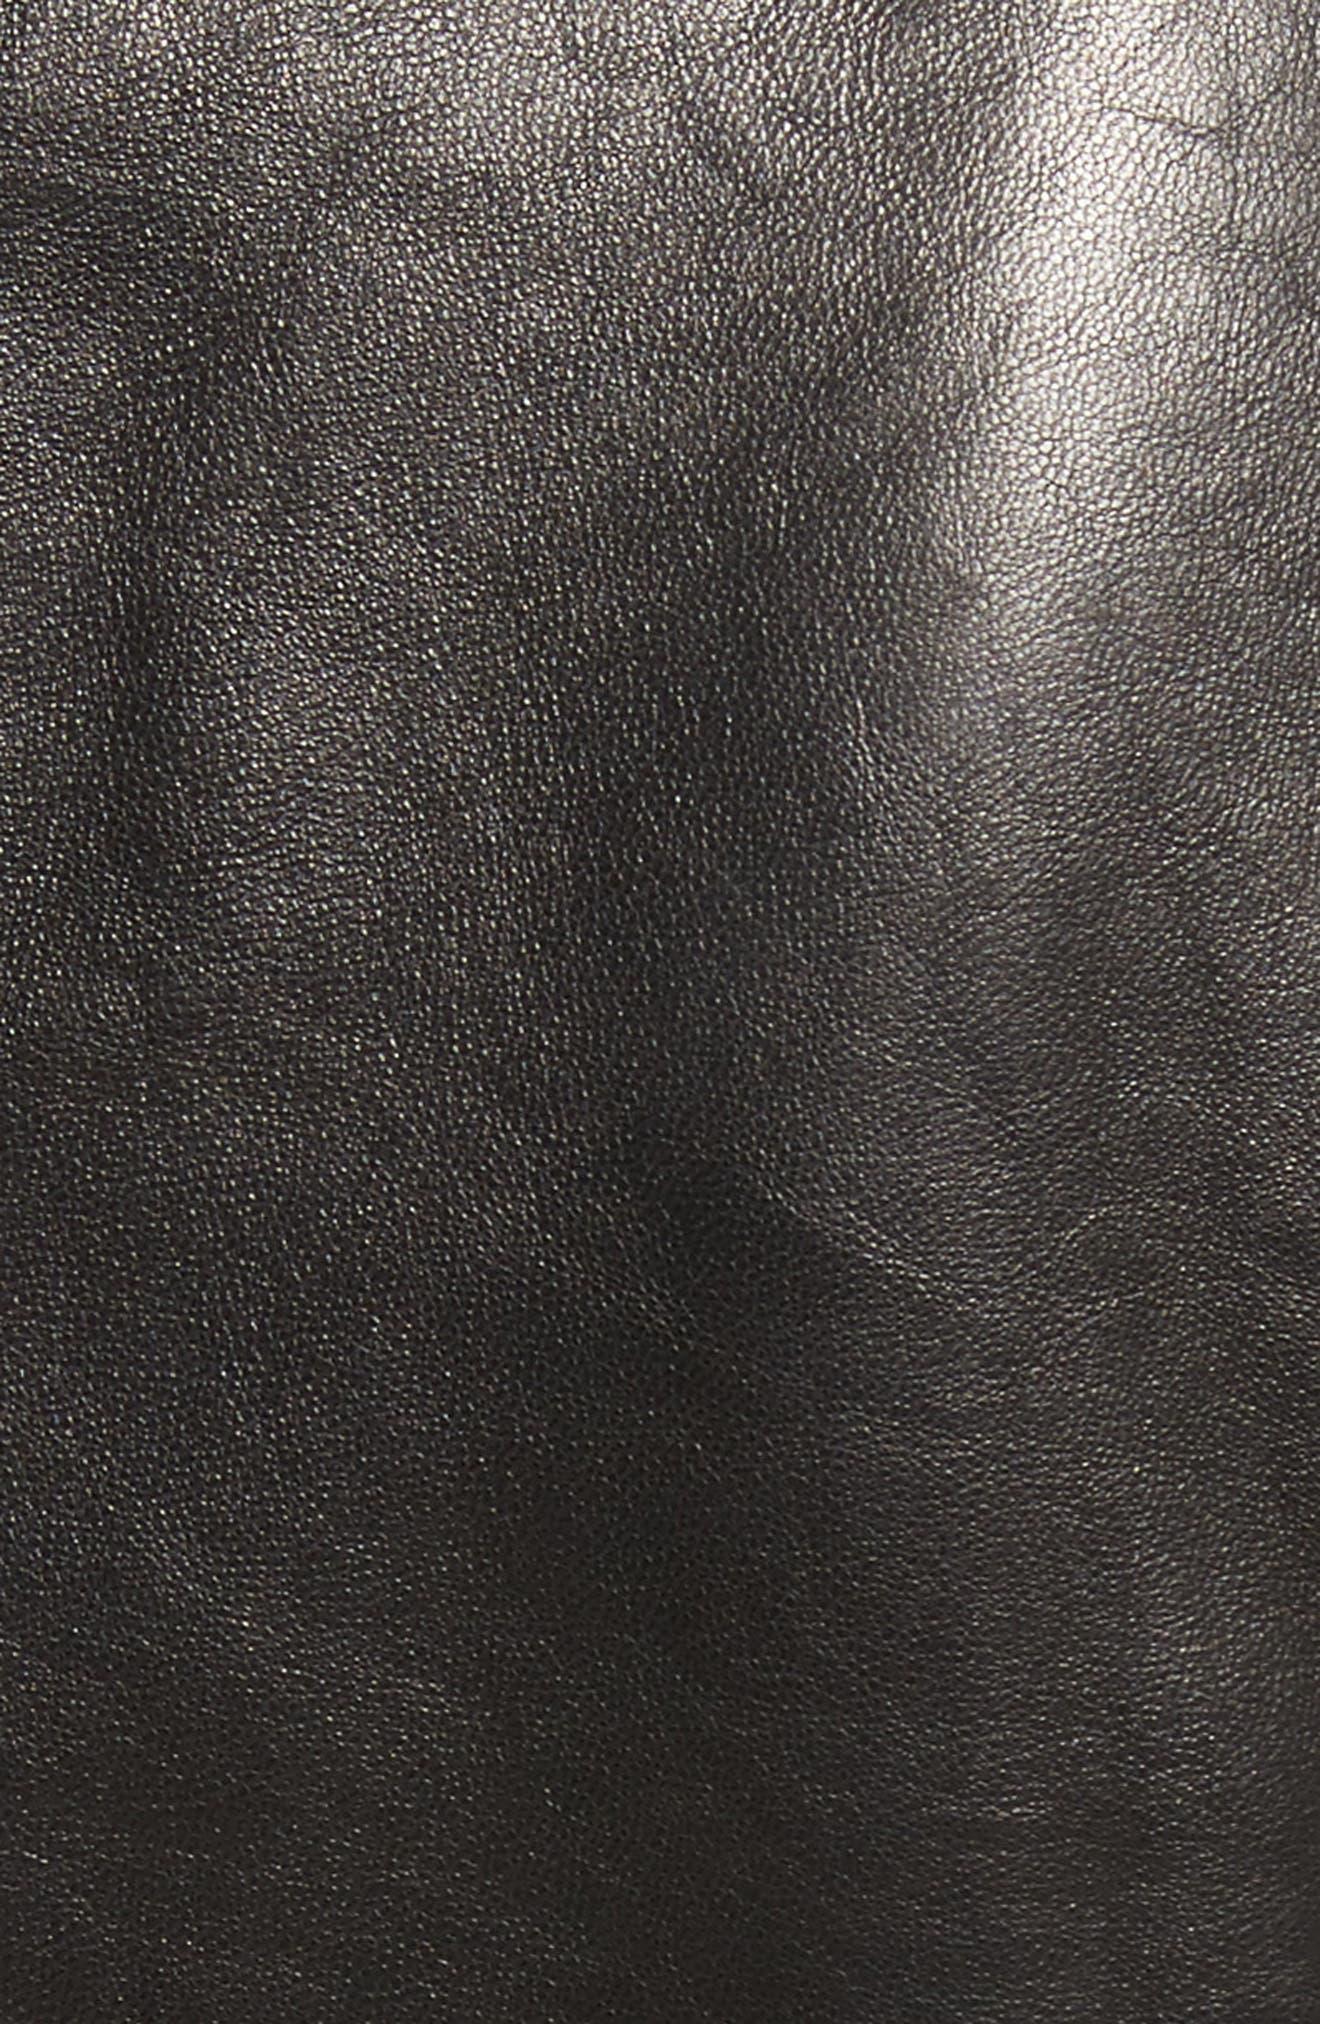 Studded Leather Jacket,                             Alternate thumbnail 5, color,                             001